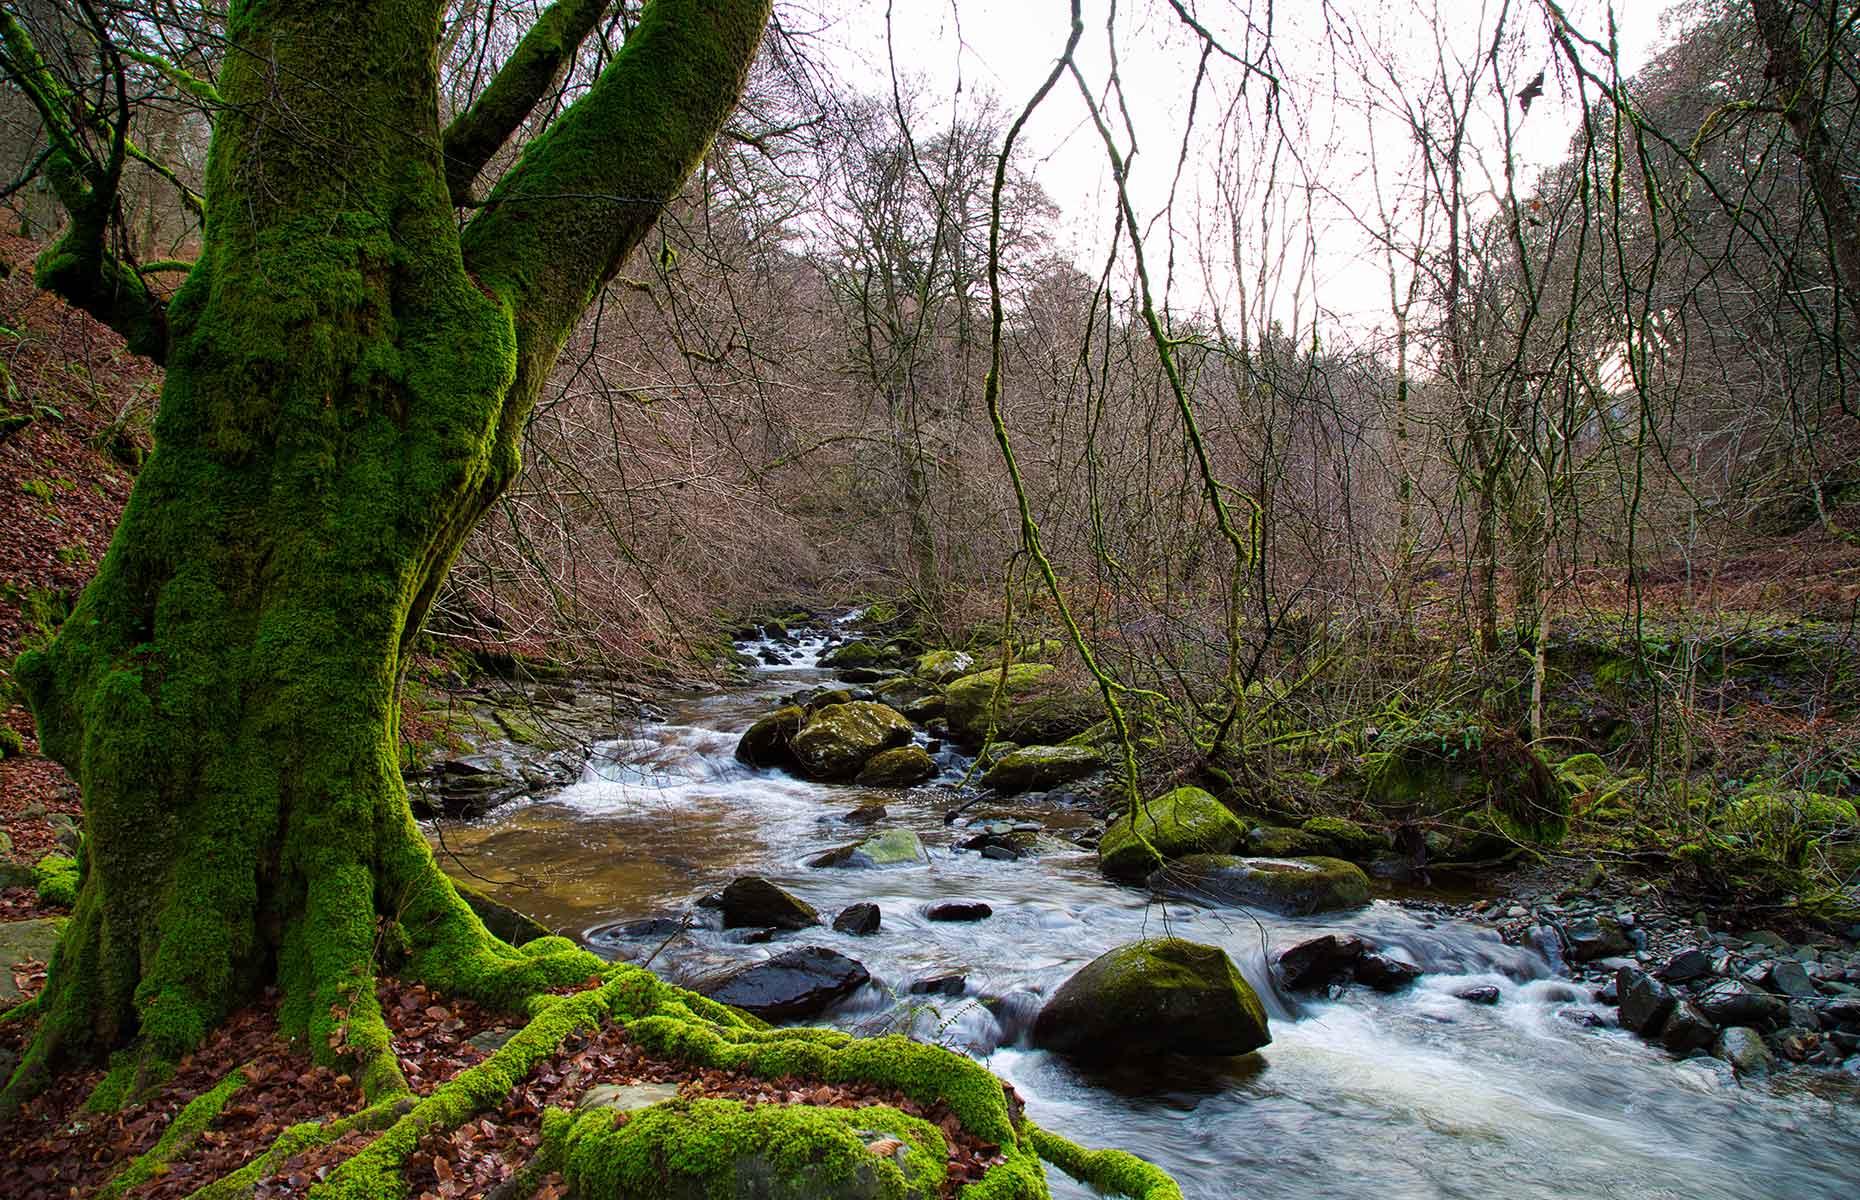 Birks of Aberfeldy (Image: Alex Nicol/Shutterstock)